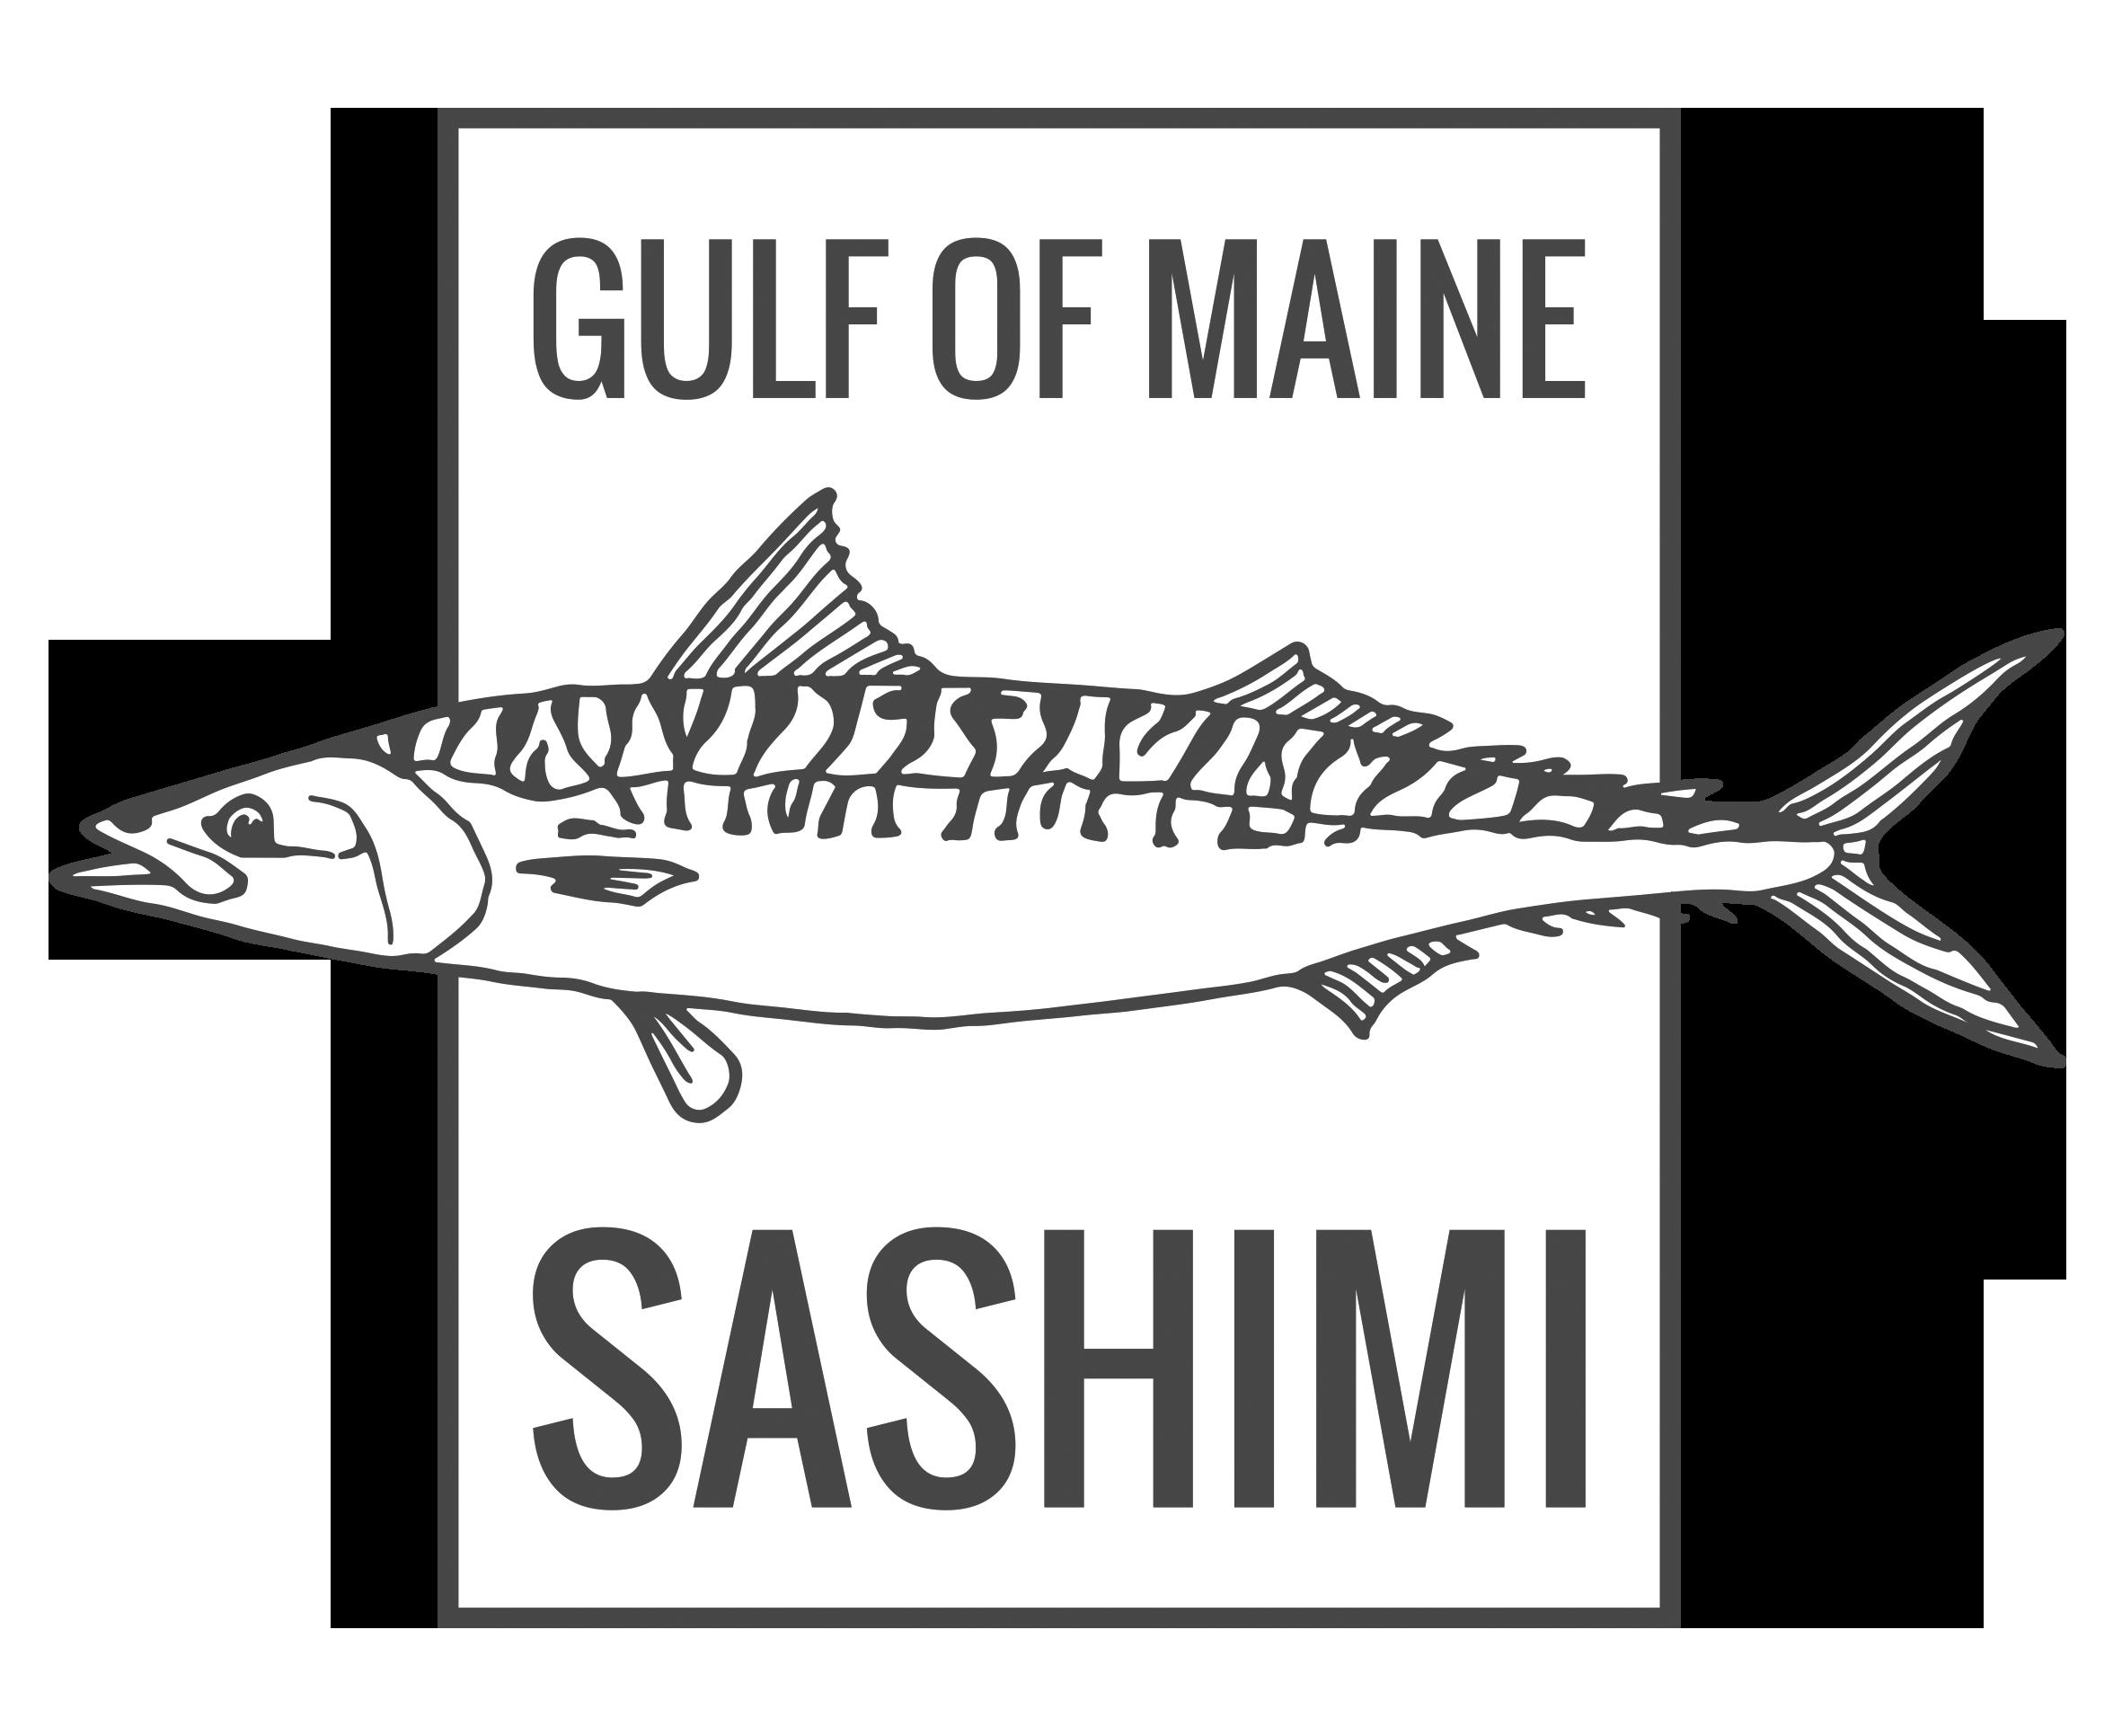 gom_sashimi_logo copy.png